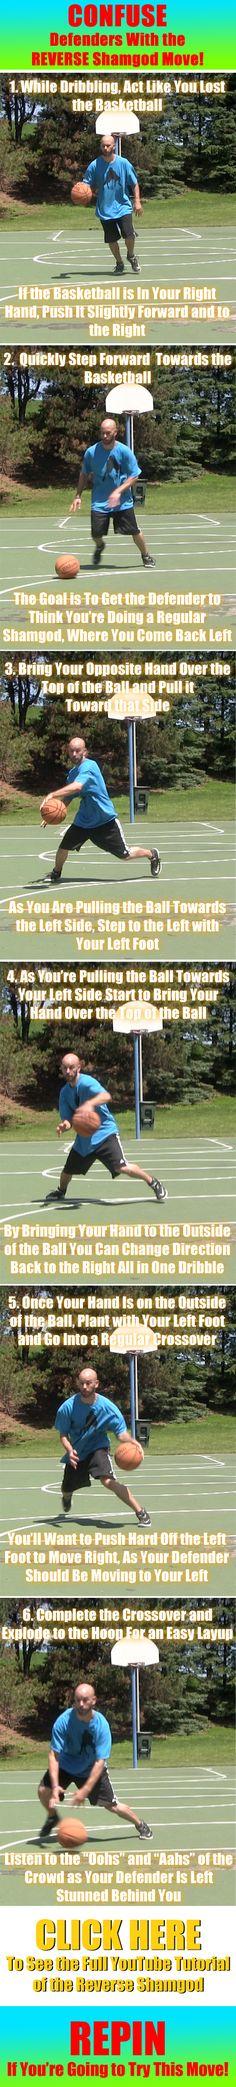 Sick basketball move to totally confuse defenders! #basketball #basketballmoves